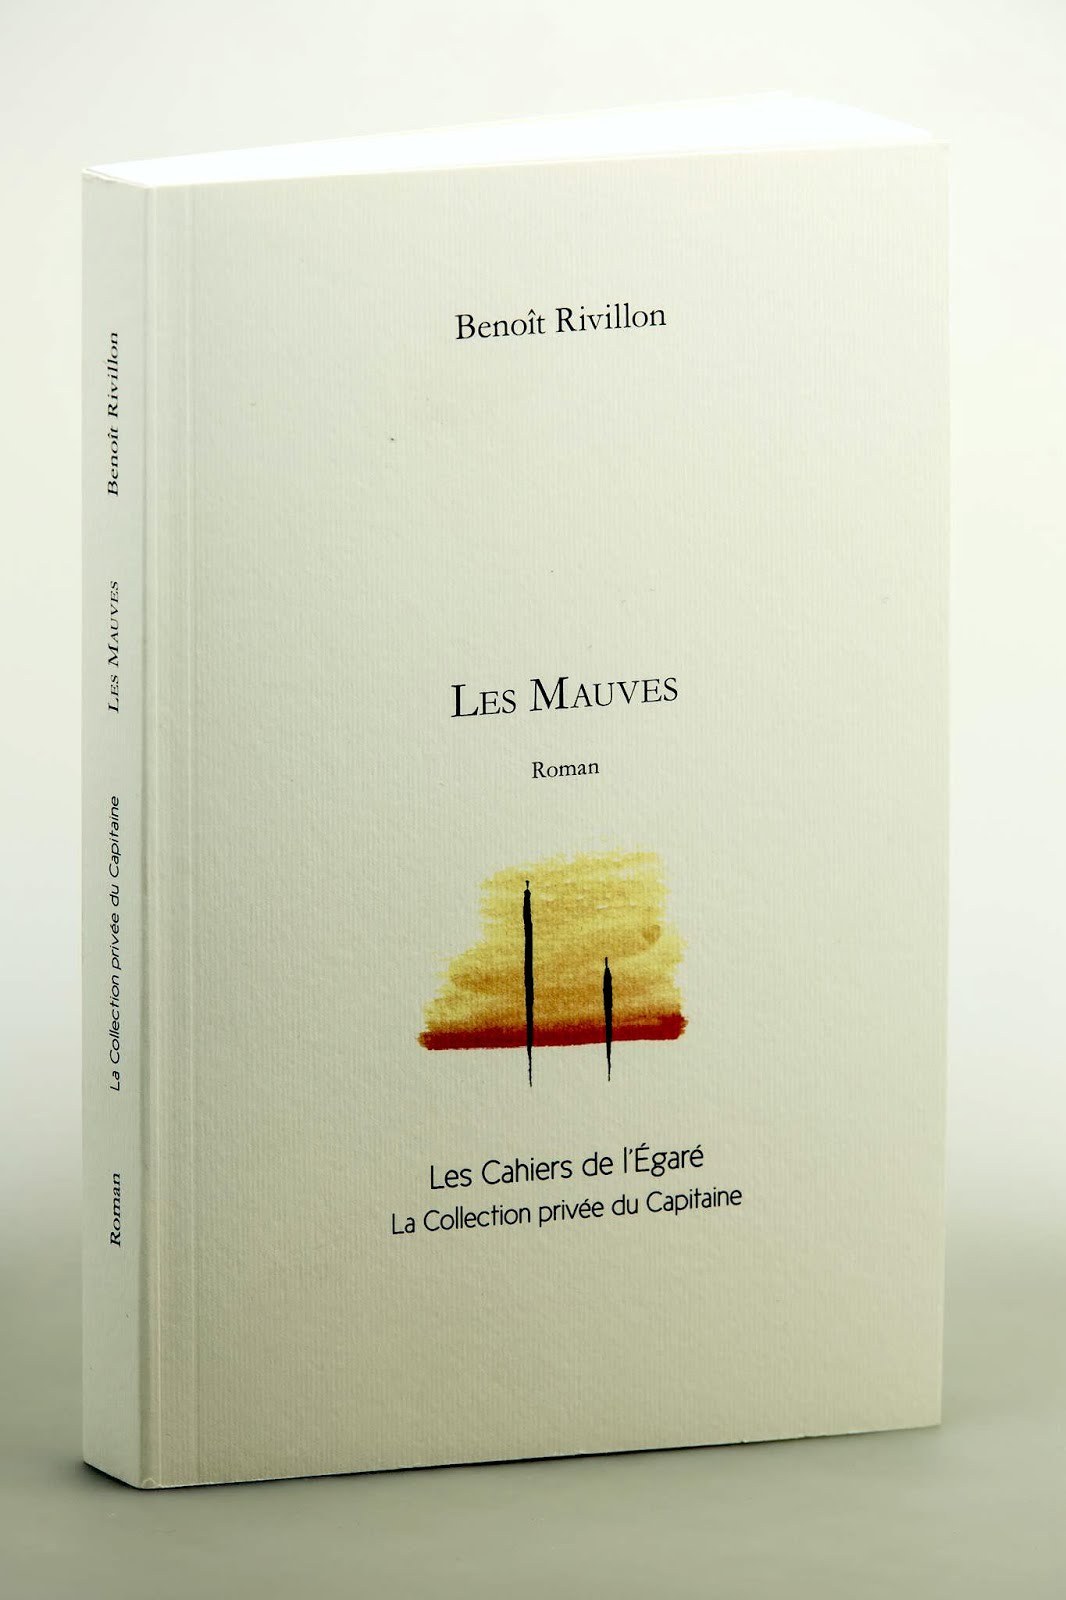 Les Mauves (2016)